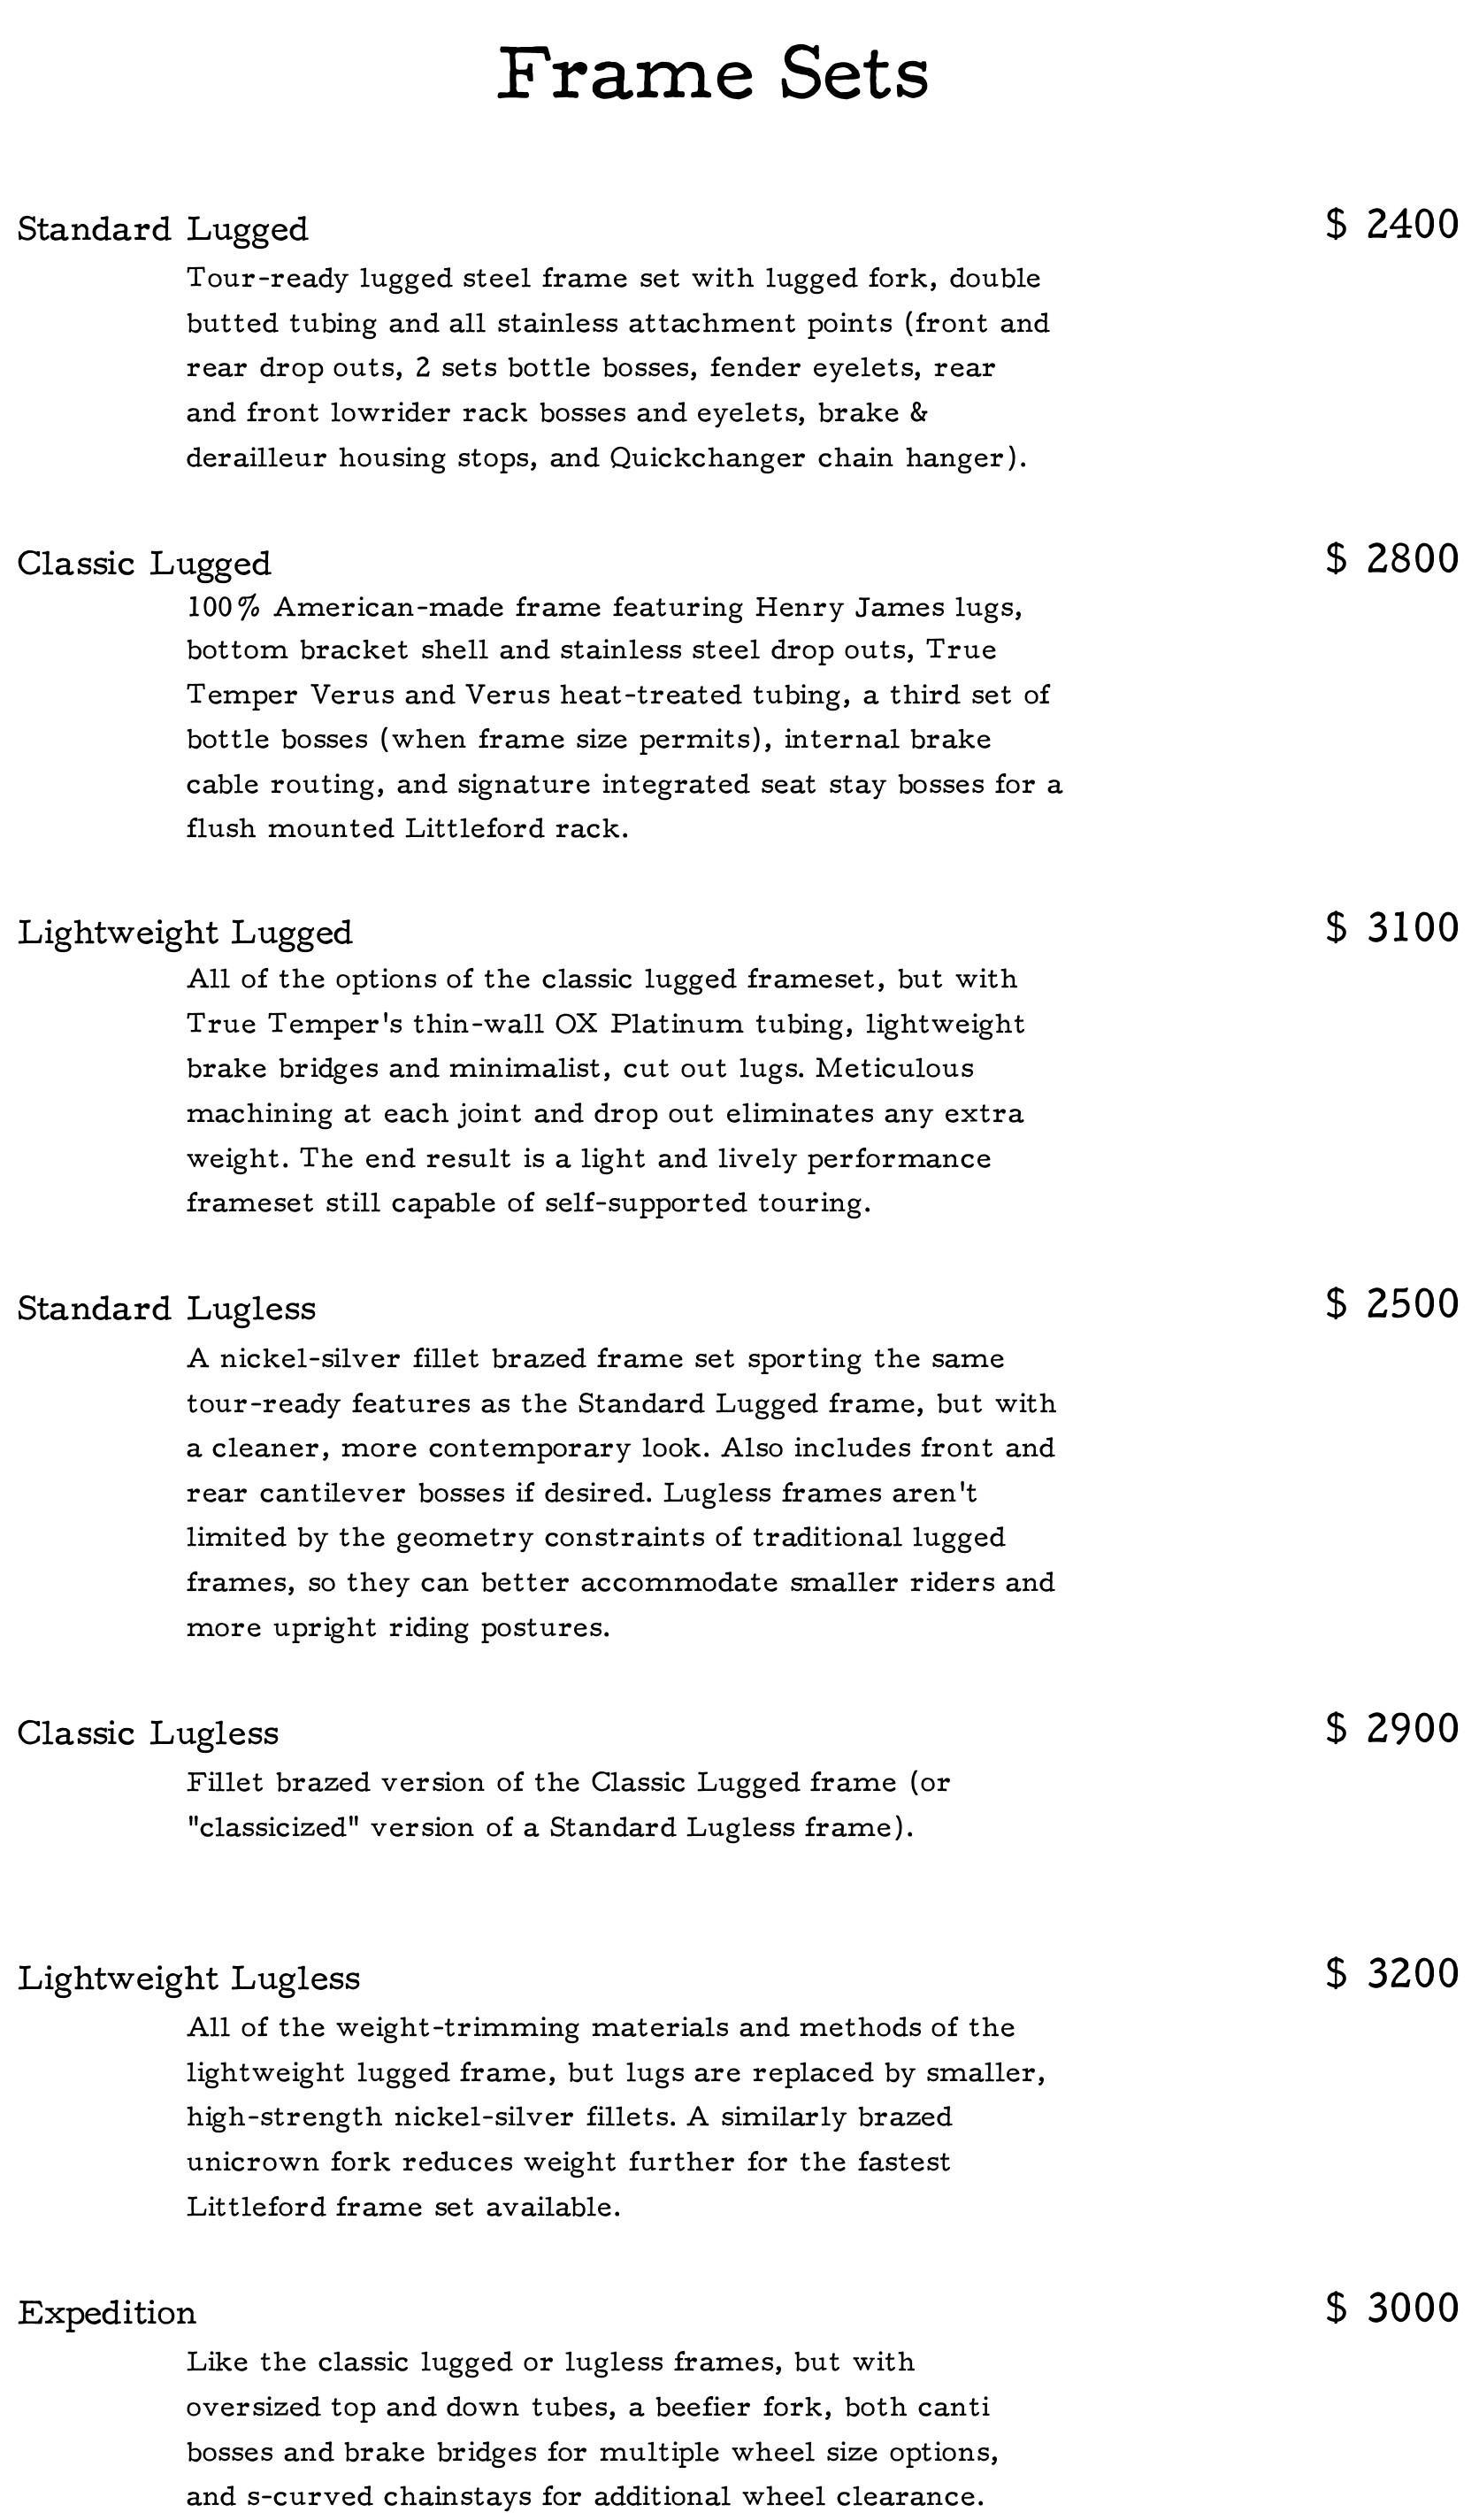 frameset pricelist 10-11-14